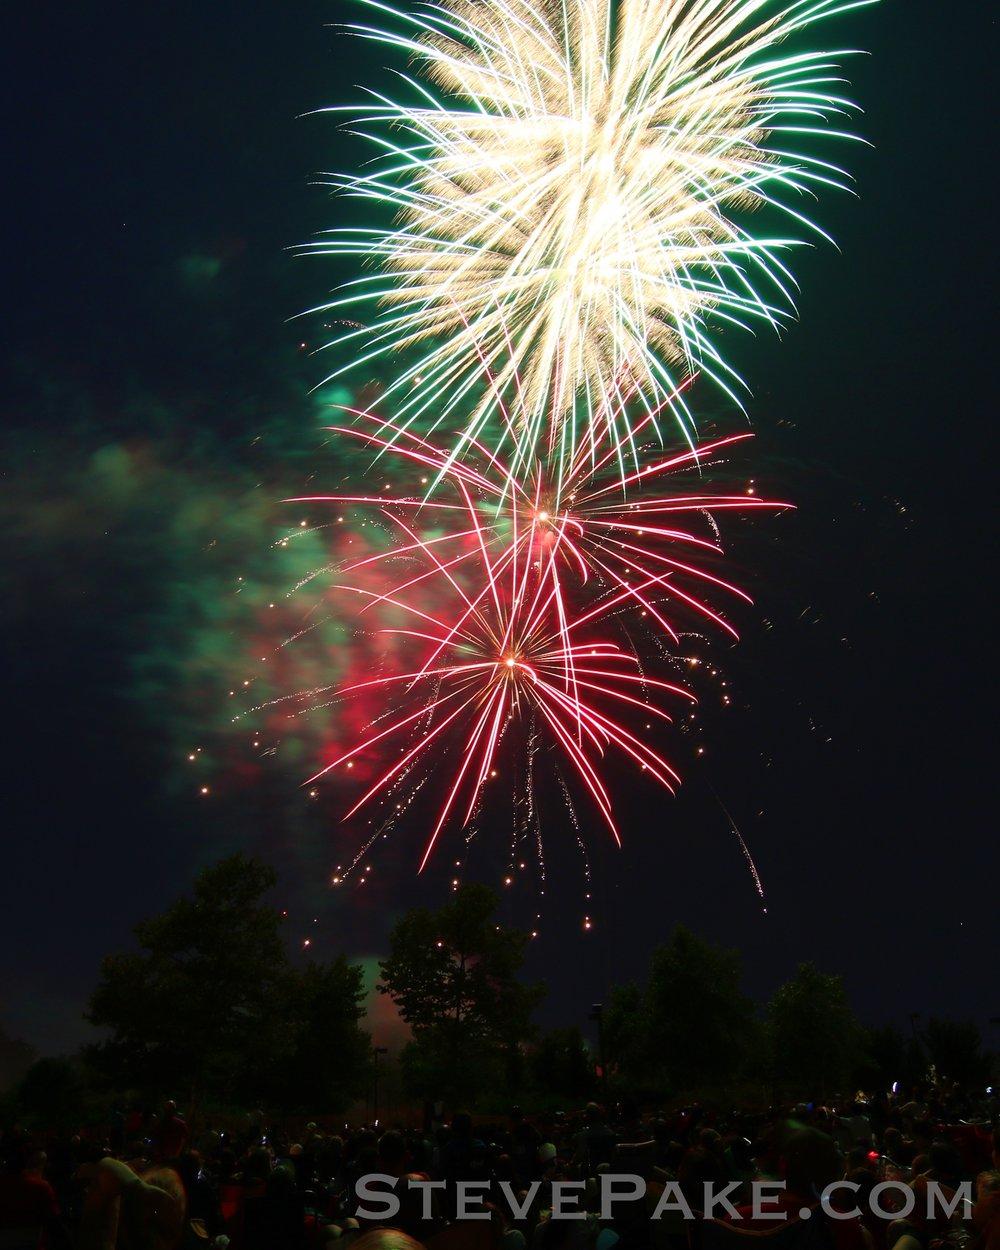 Fireworks2018_38_GE3A8576ap-HD-WM.jpg